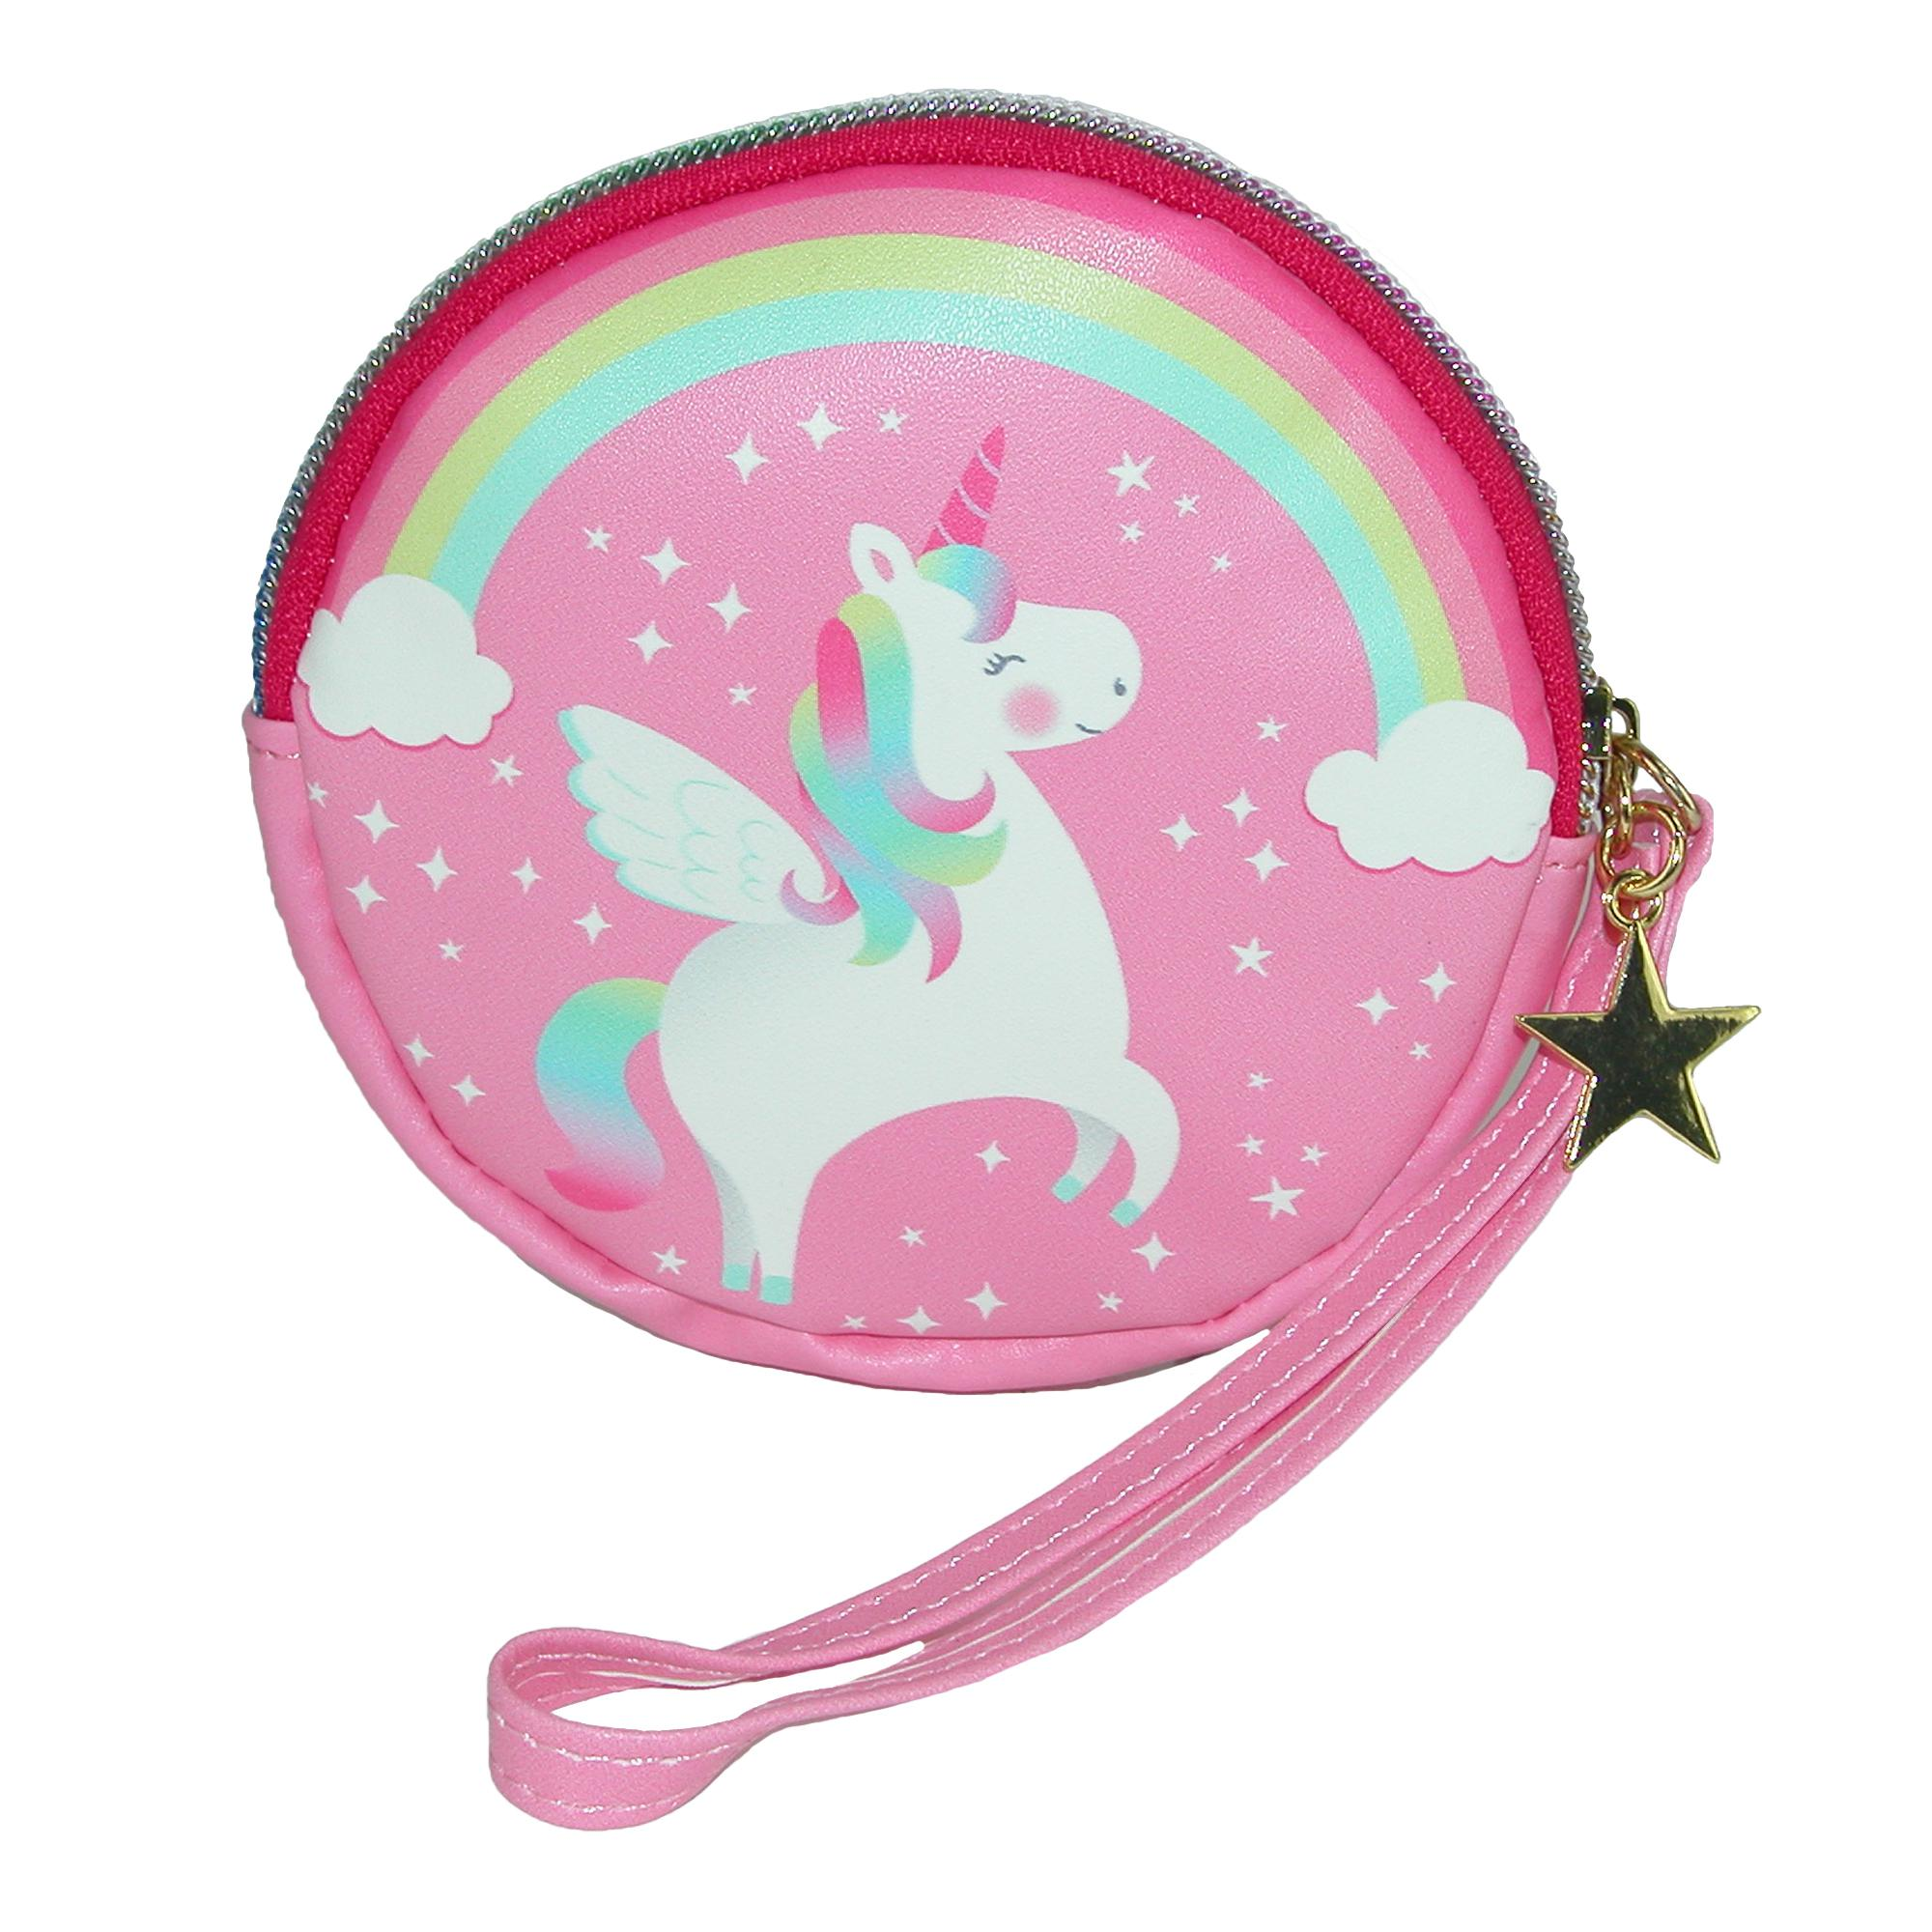 Disney Princess wallet Licensed zipper coin purse Belle Cinderella new